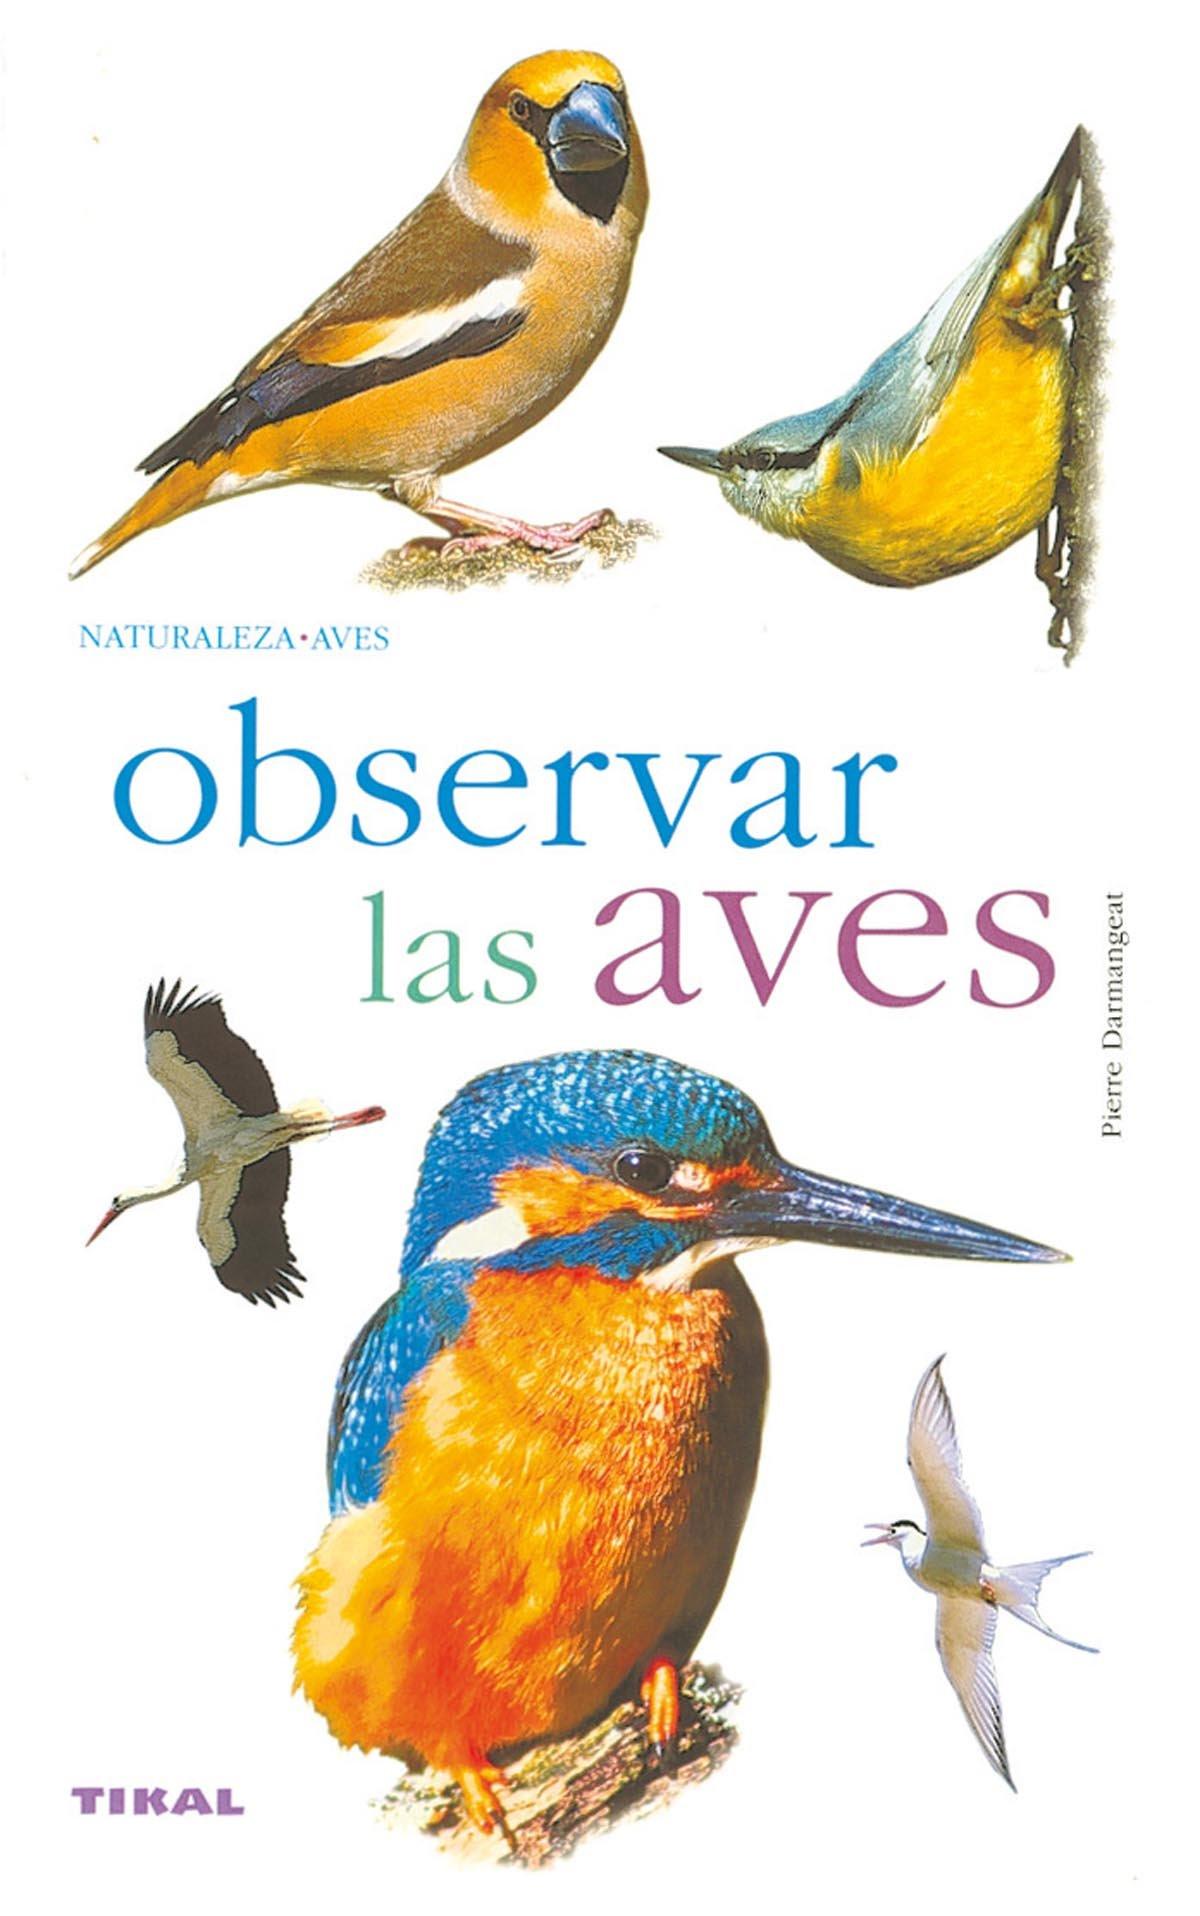 Observar Las Aves(Naturaleza-Aves): Amazon.es: Darmangeat, Pierre: Libros